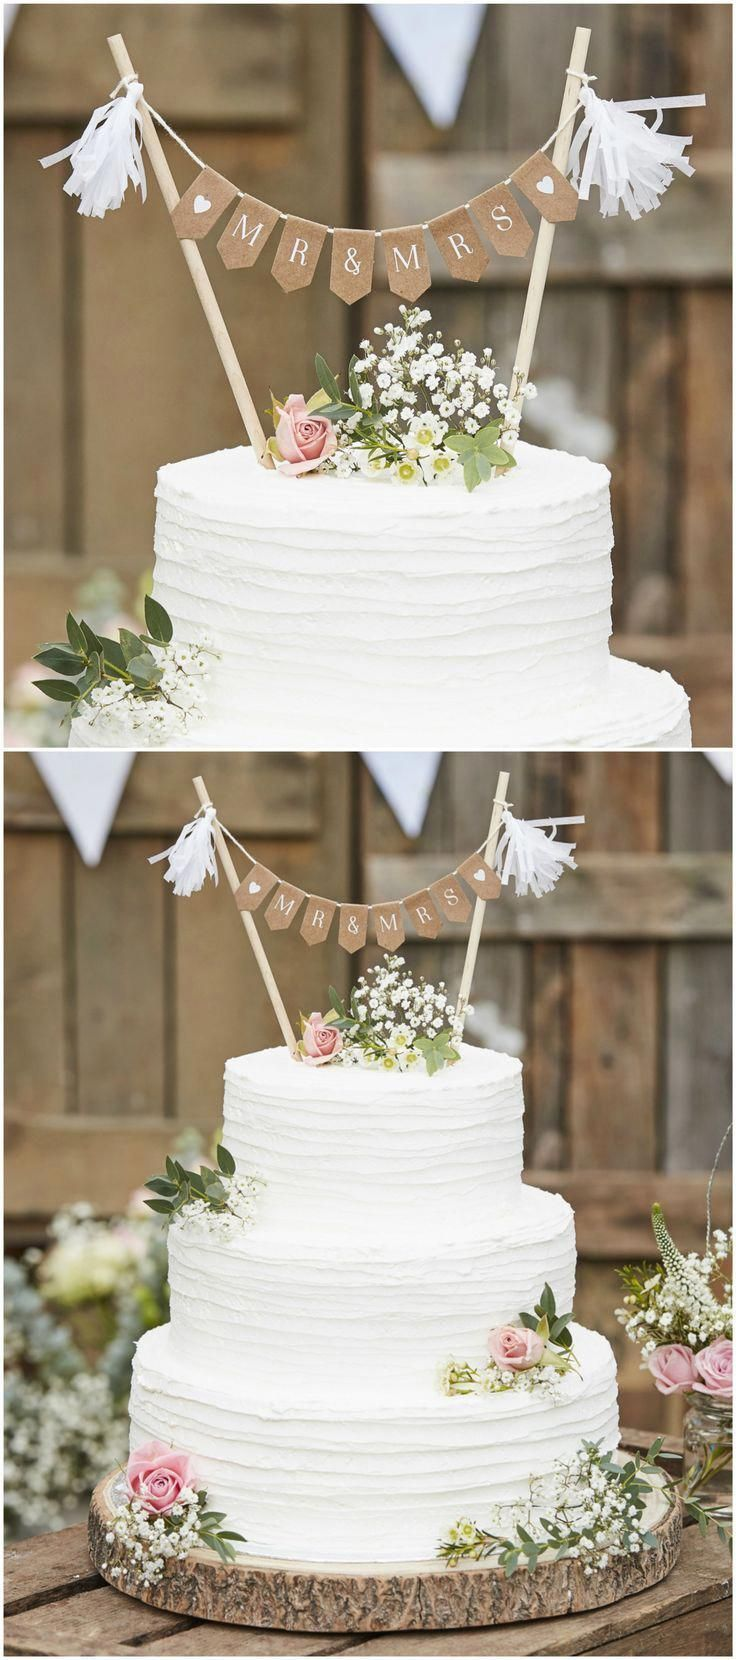 Vintage Hochzeit Dekorations Ideen Boho I Rustic I Wedding I Fairy